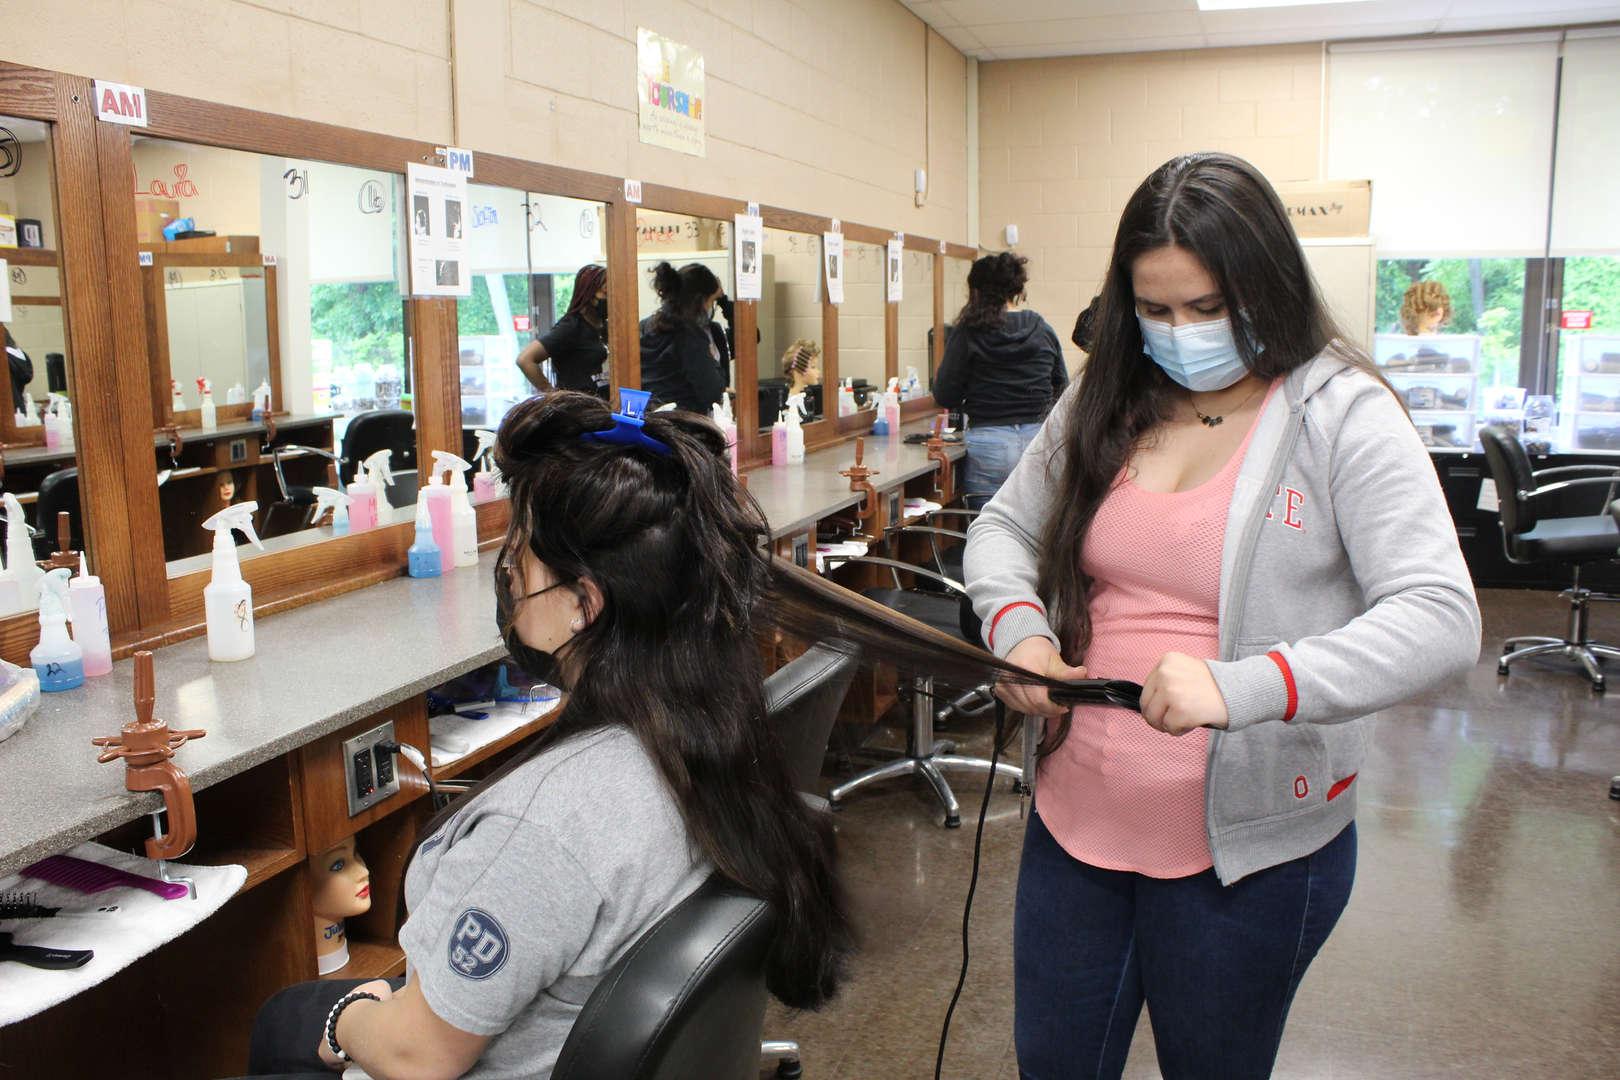 Girl straighten the hair of another girl usin ga flatiron tool